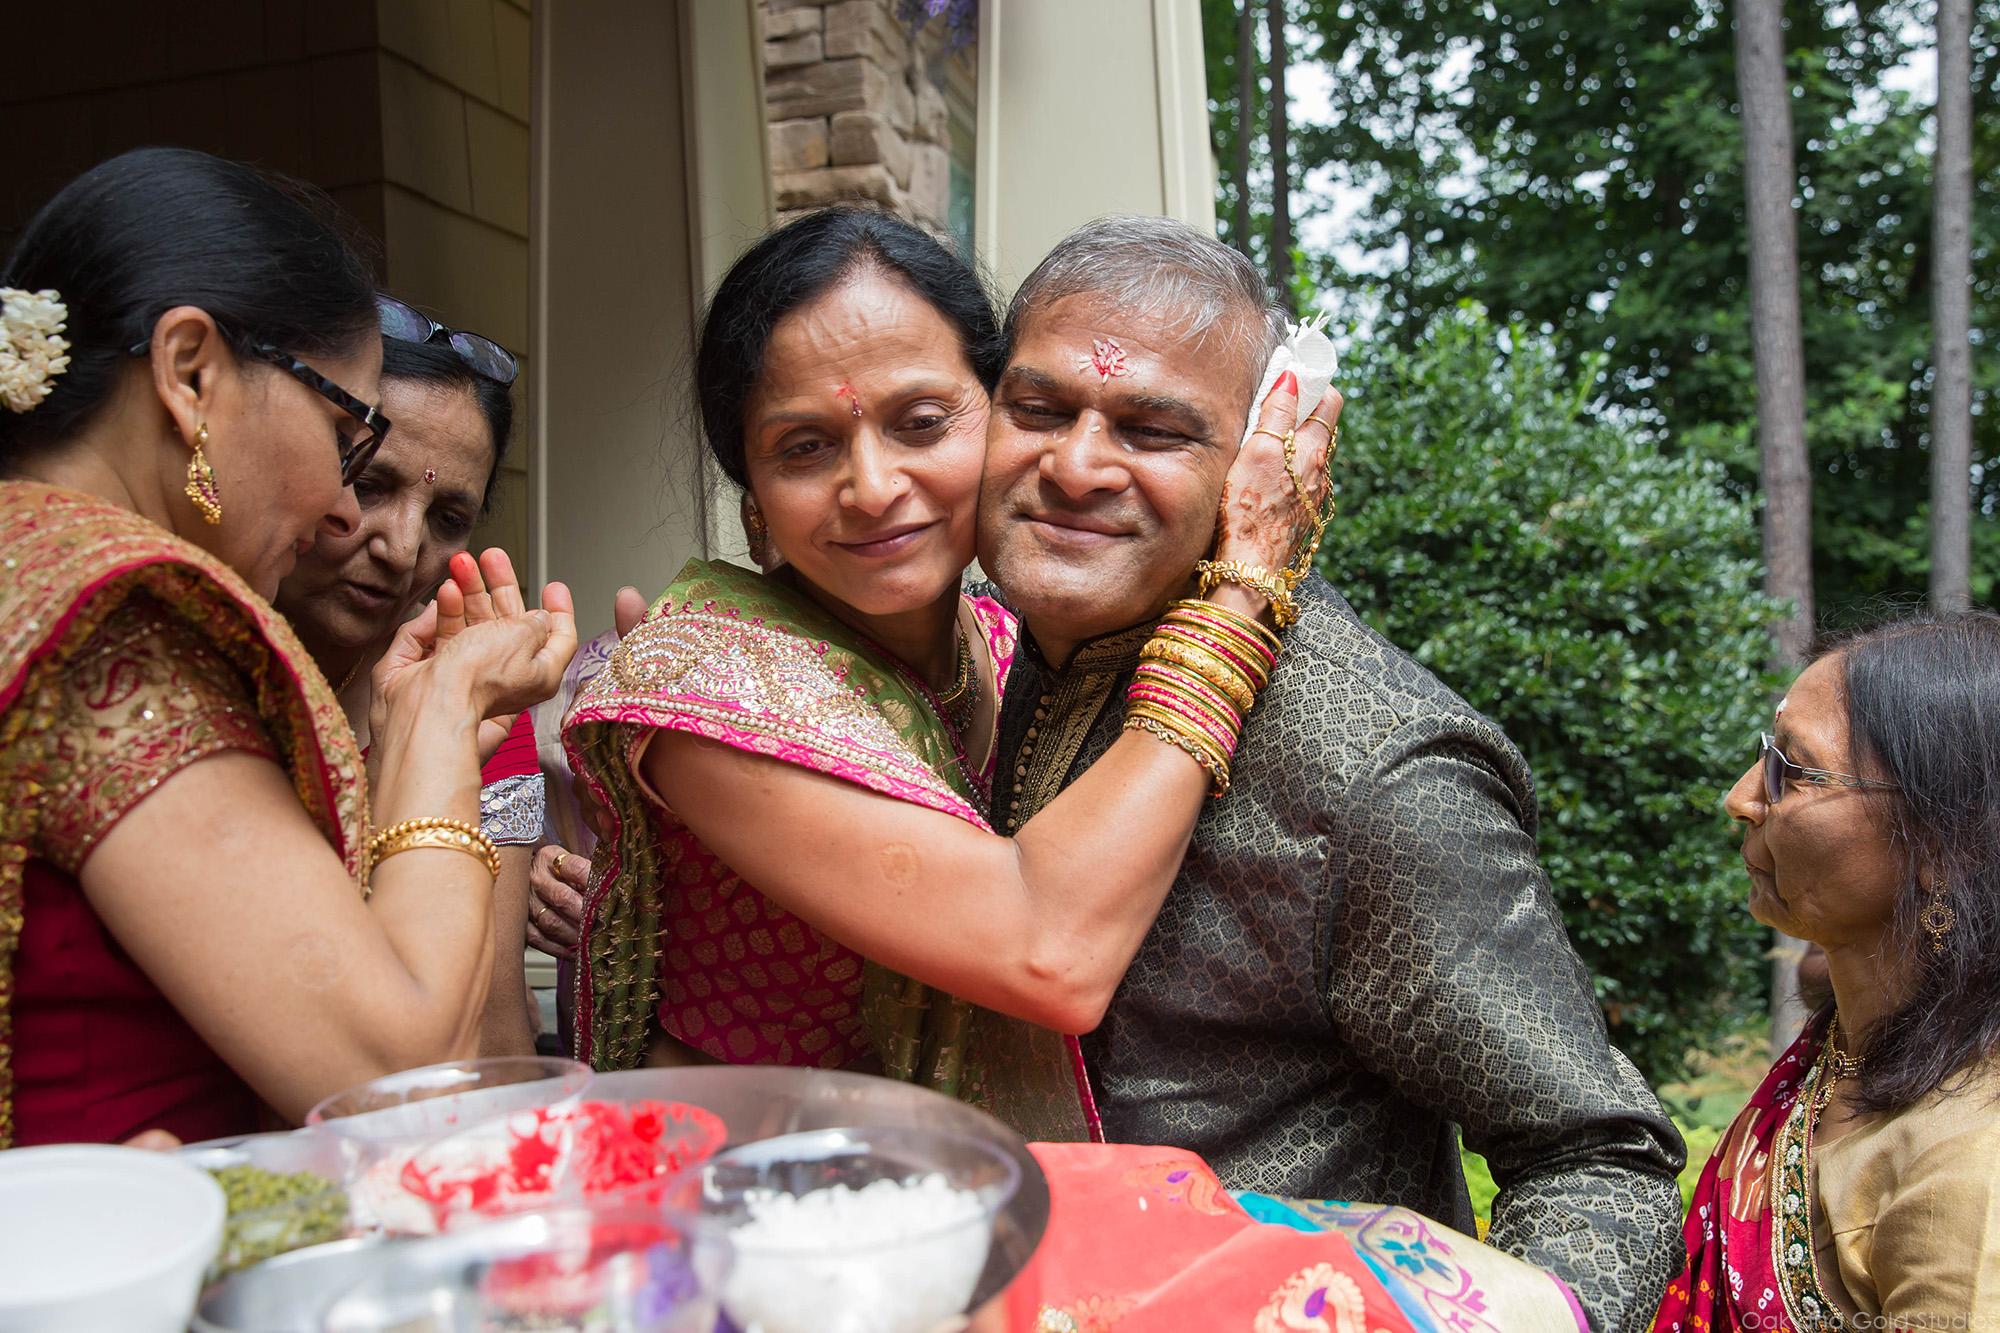 hindu_welcome_brides_side